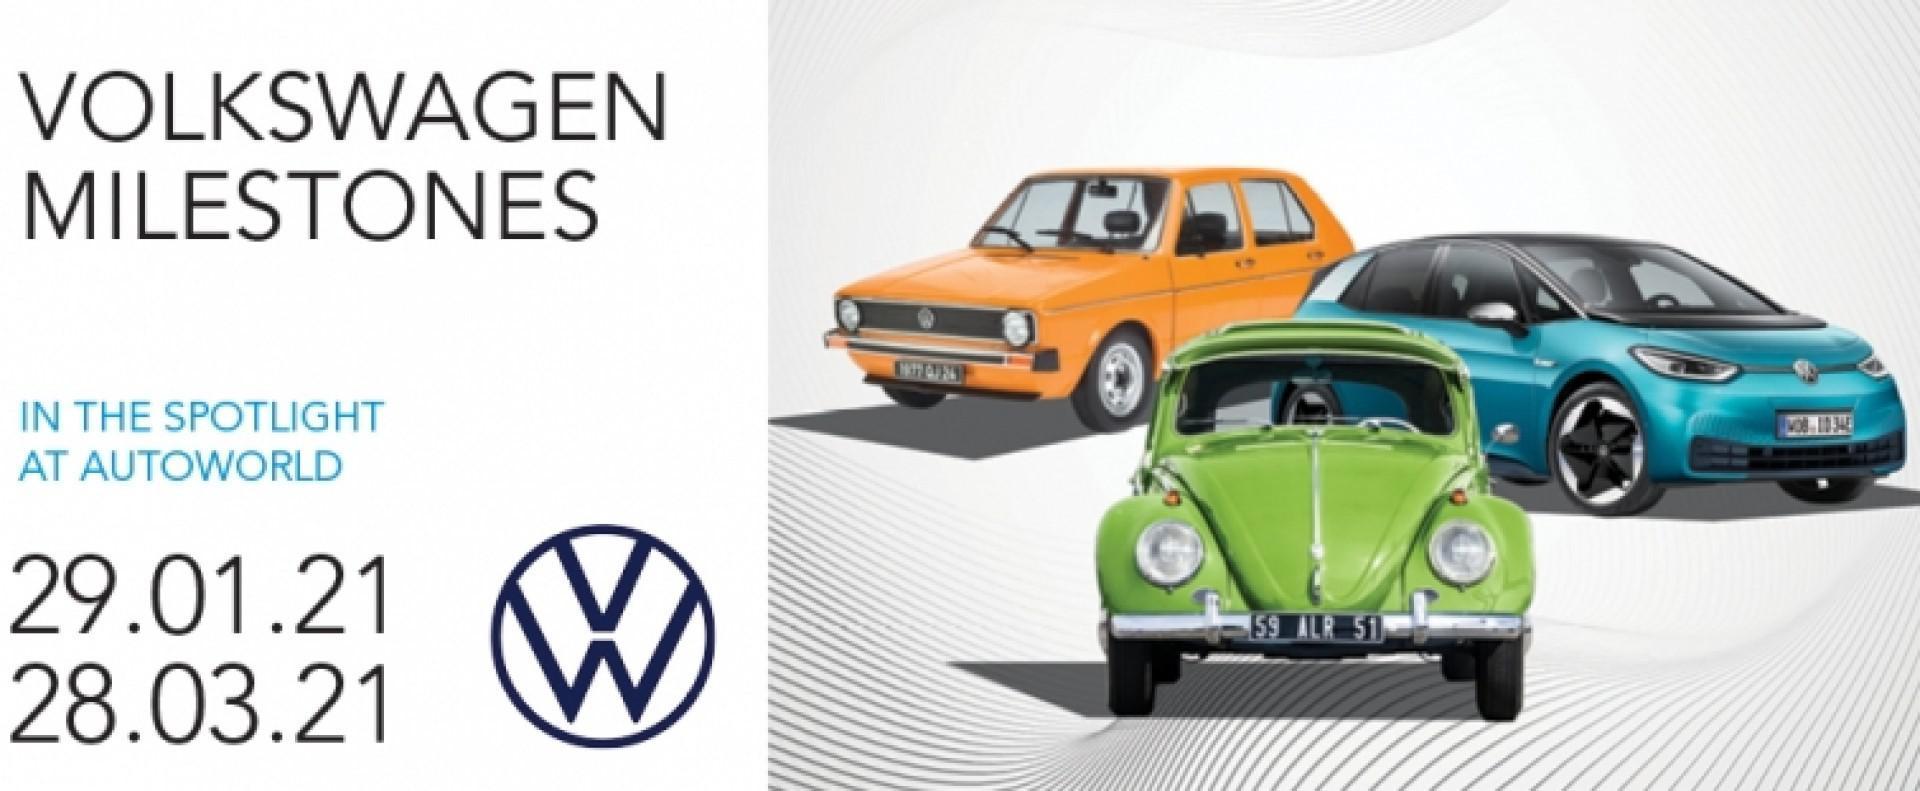 Autoworld Museum Brussels présente VOLKSWAGEN MILESTONES